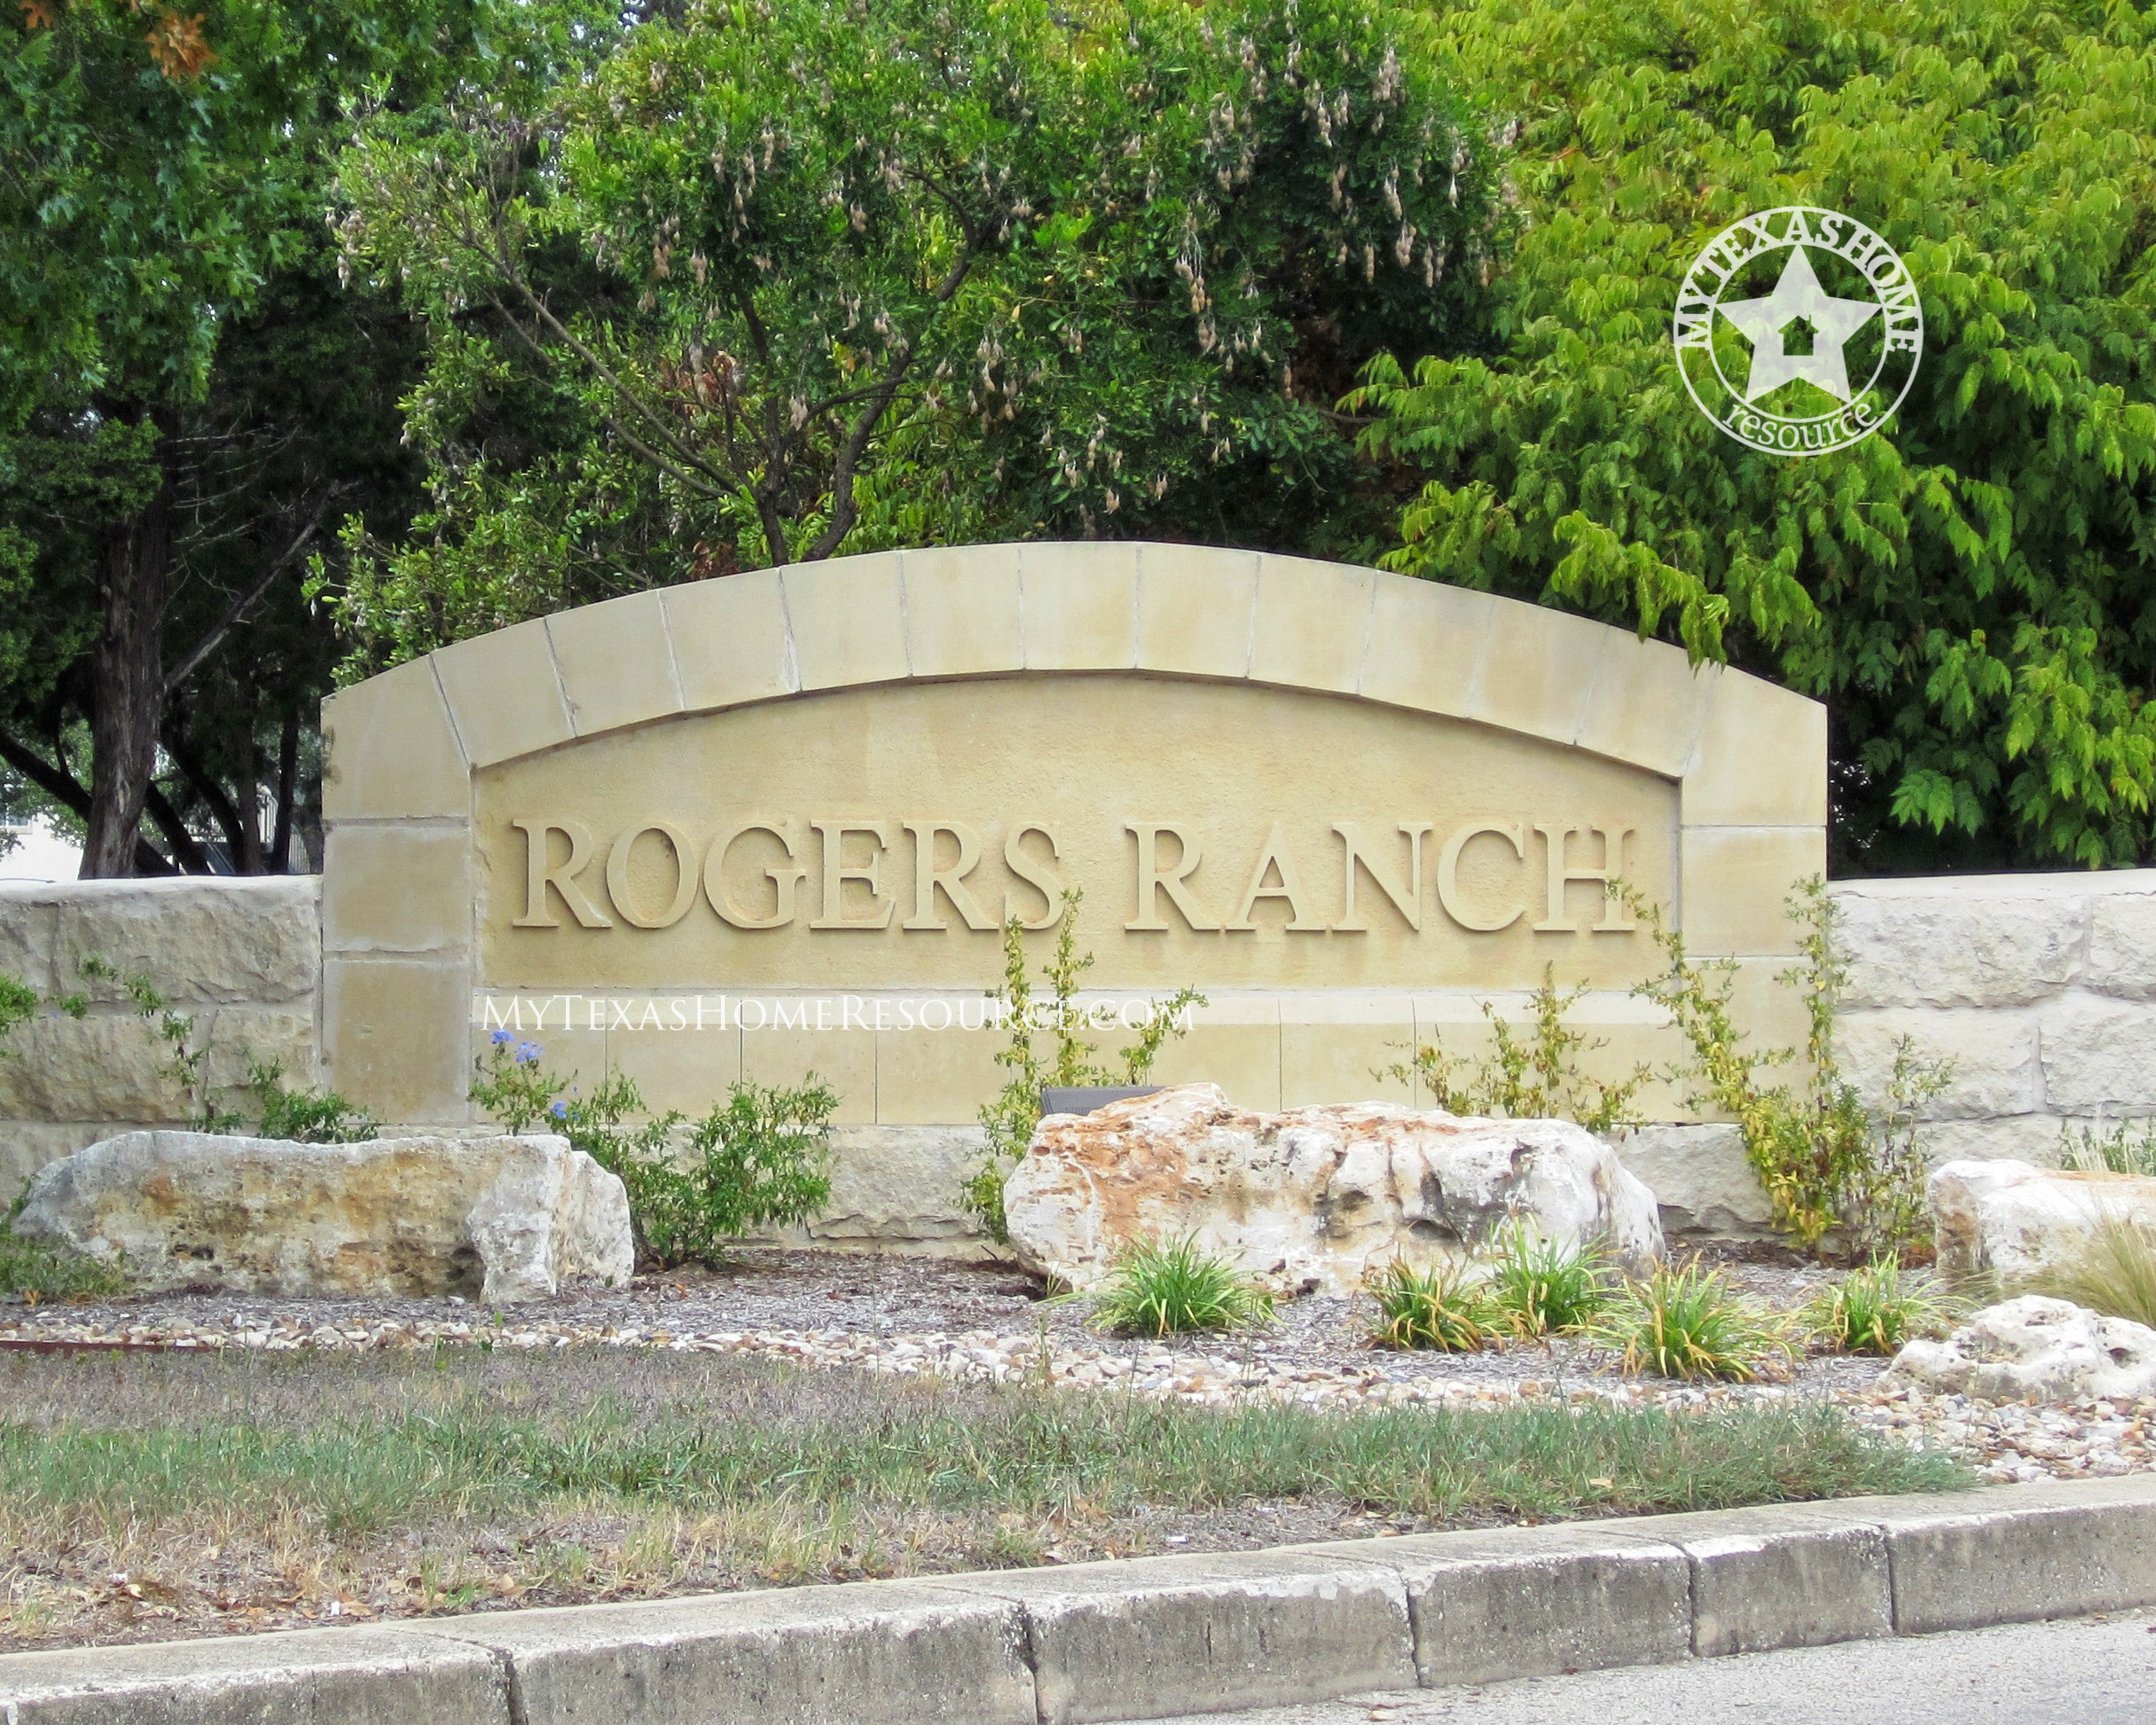 Rogers Ranch Community